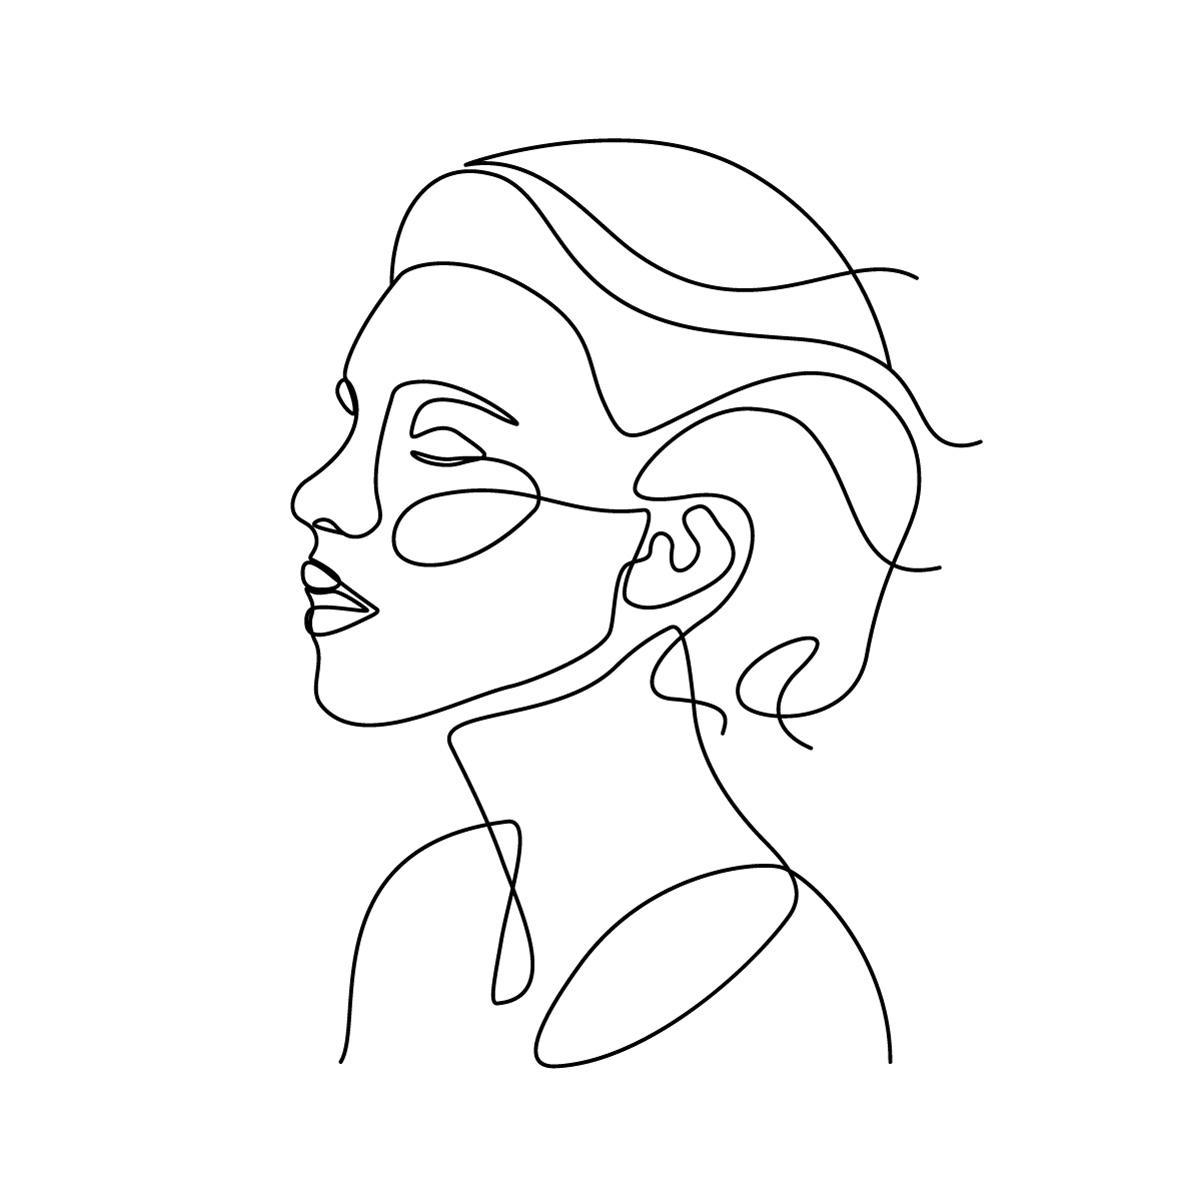 head-line-drawing-bw